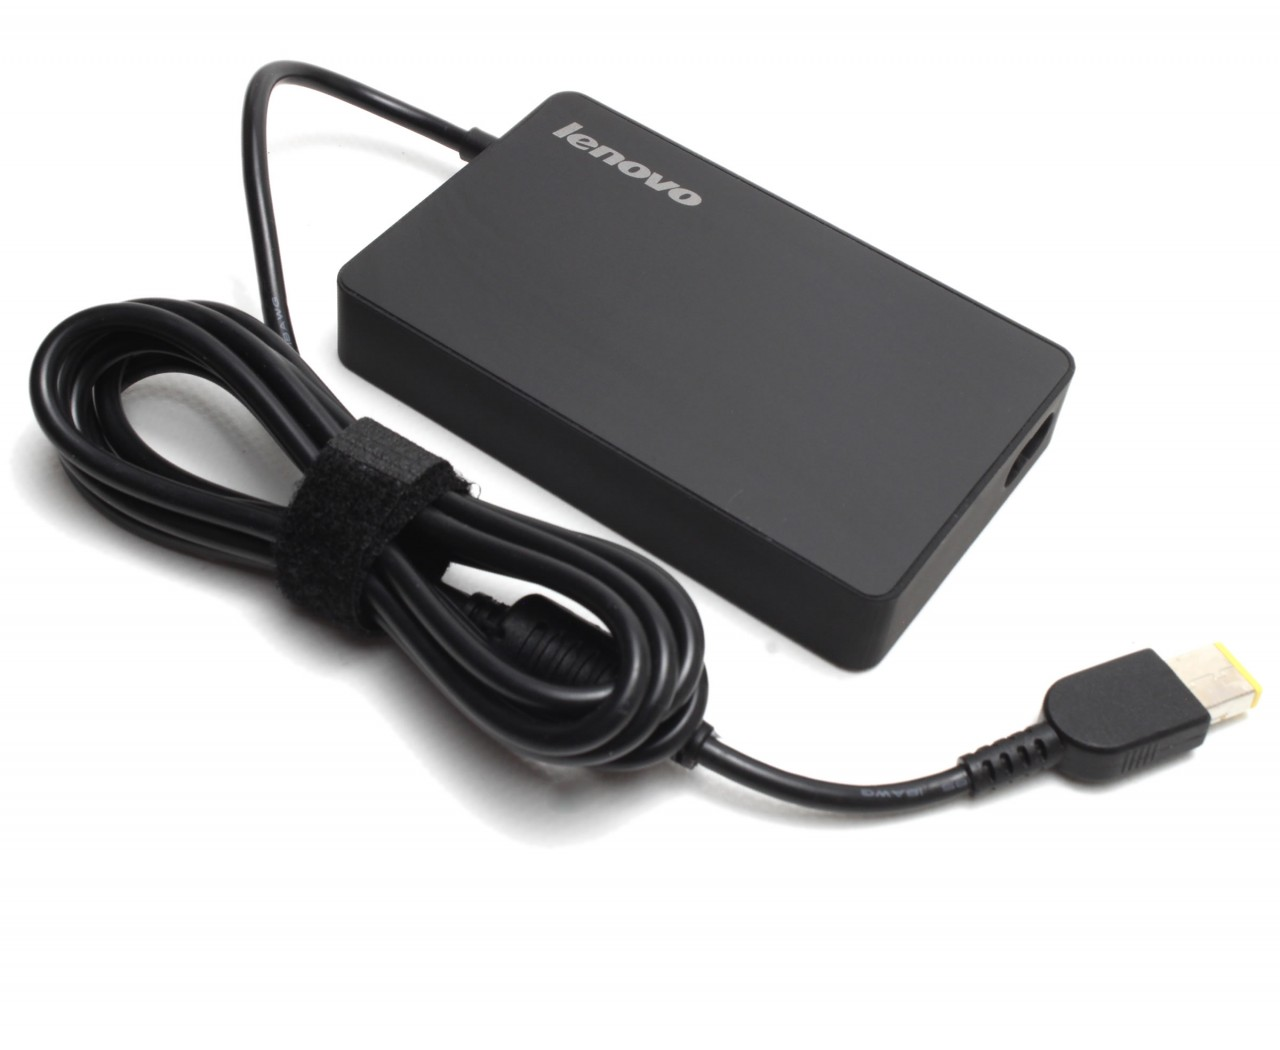 Incarcator Lenovo ThinkPad Yoga 460 20EL 65W Slim Version imagine